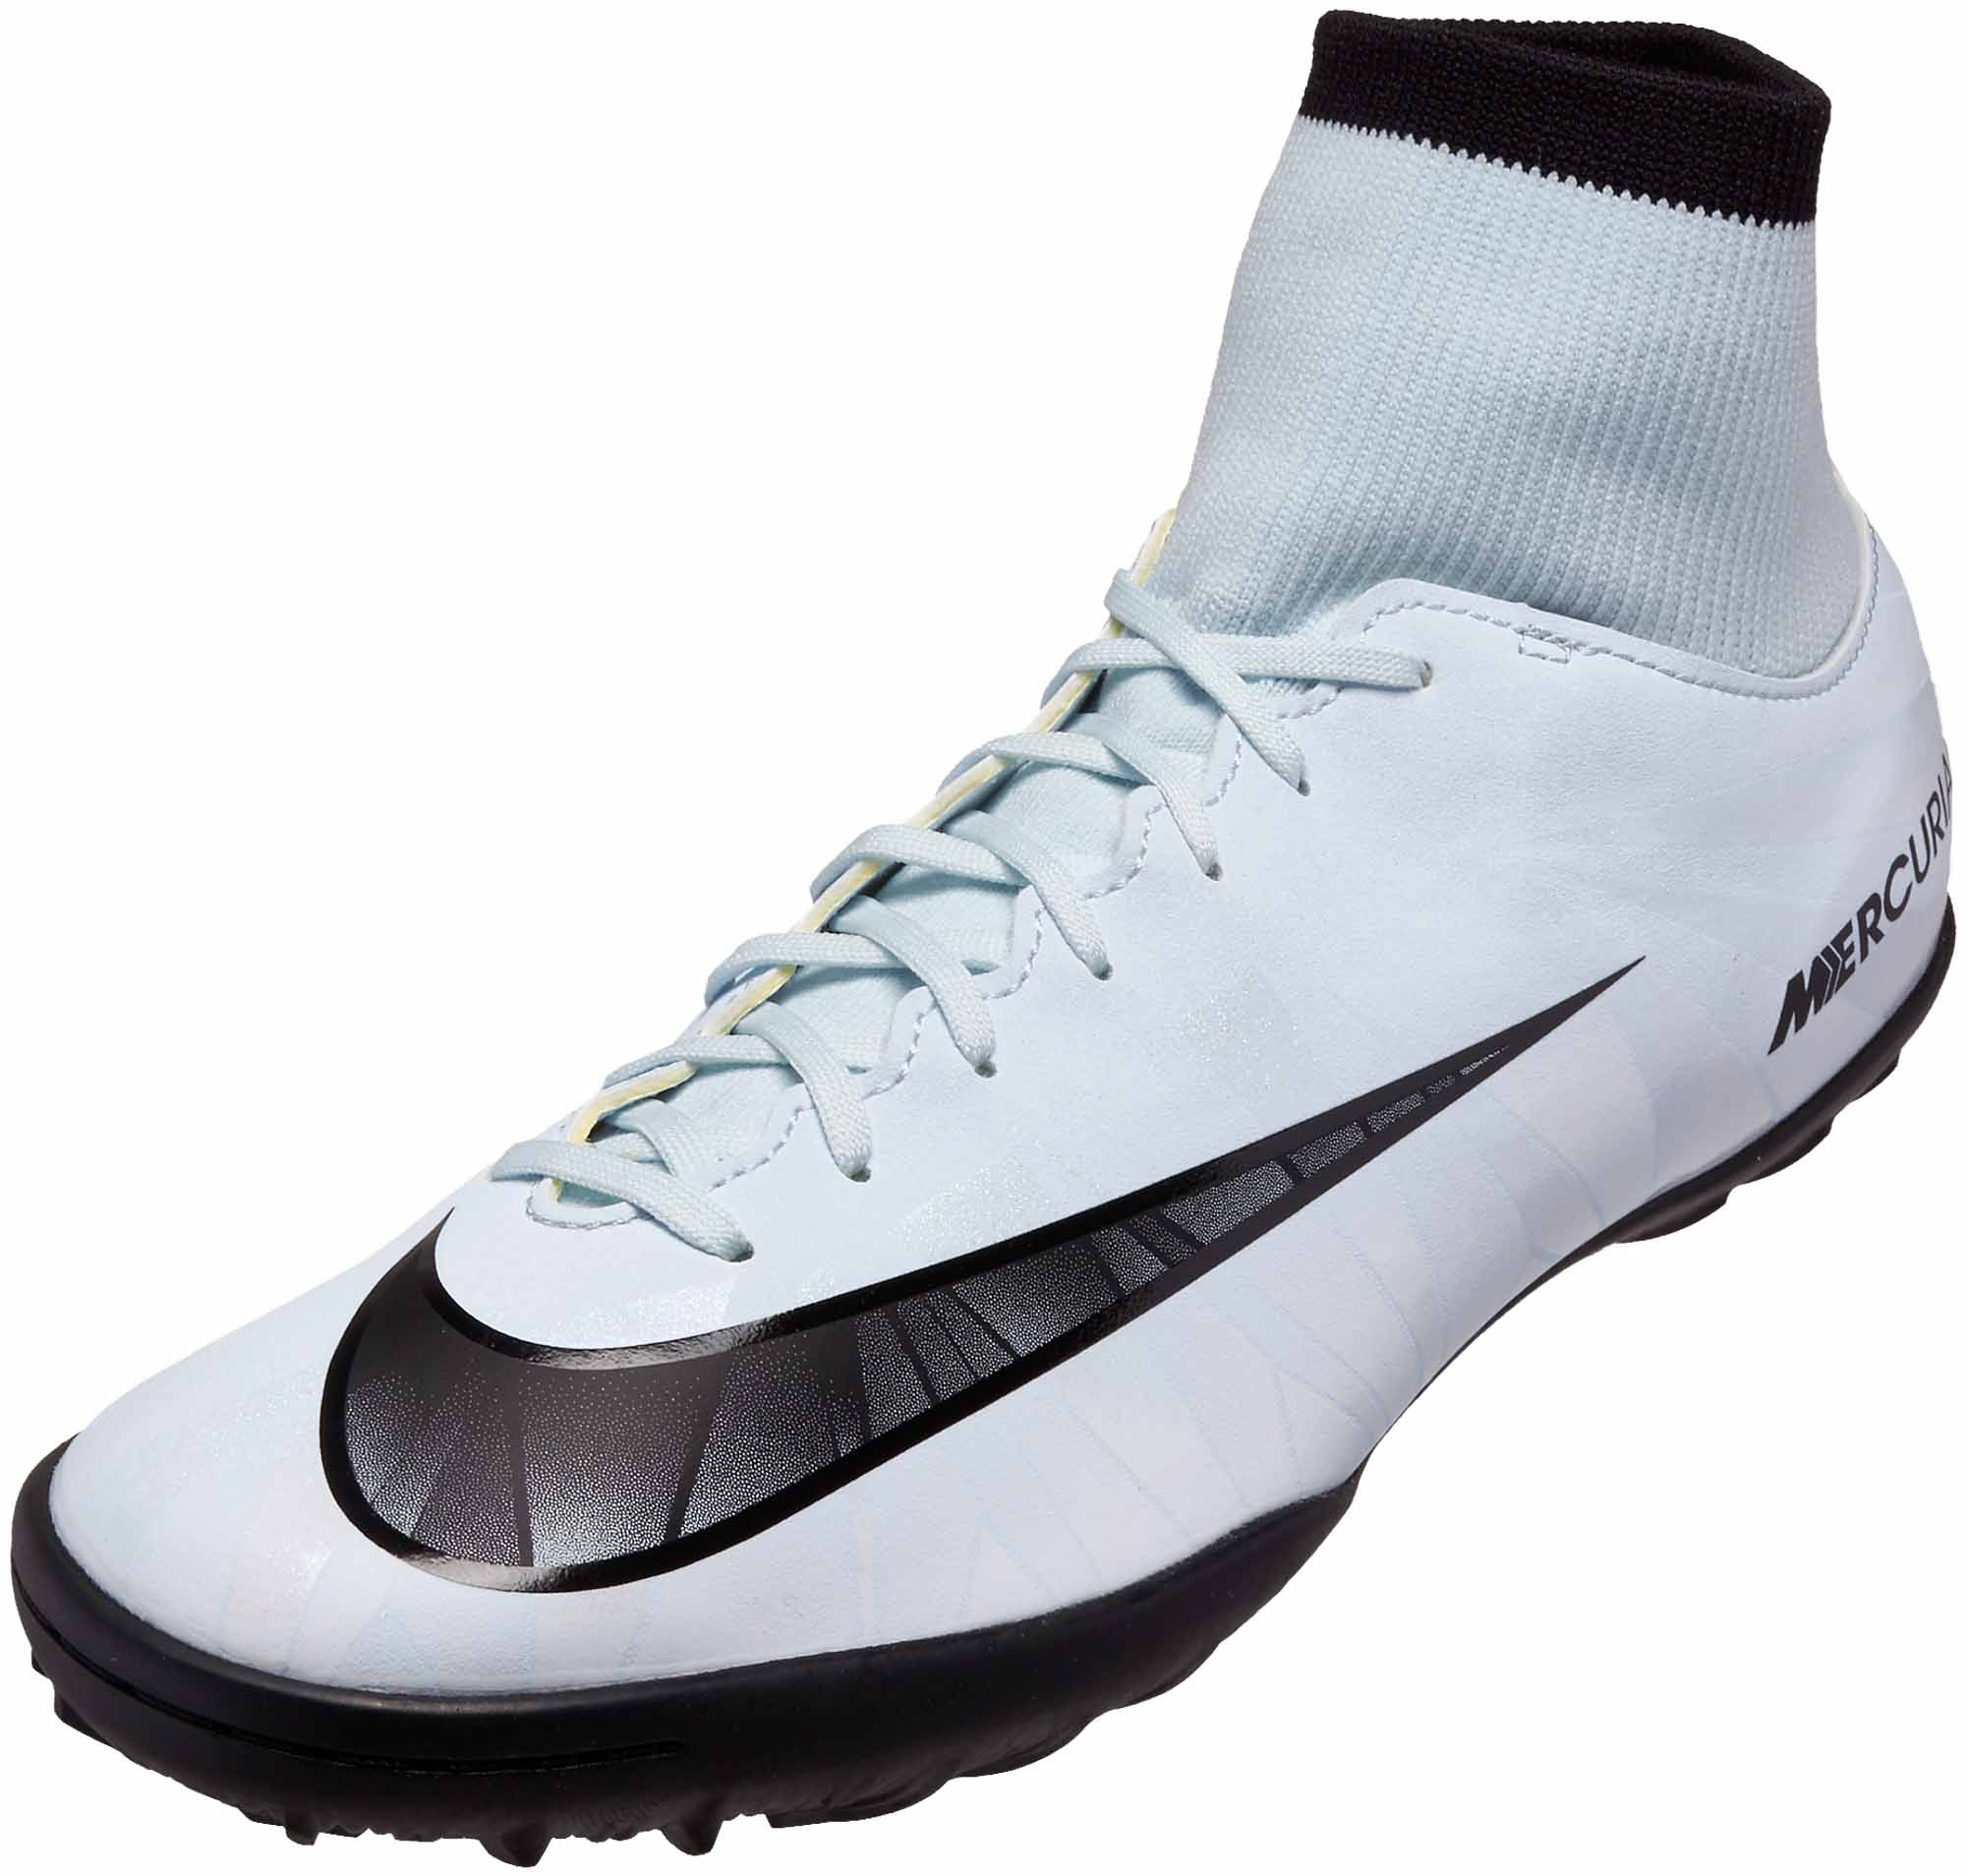 Leopardo presumir fondo  Nike MercurialX Victory VI DF TF CR7 - Blue Turf Shoes